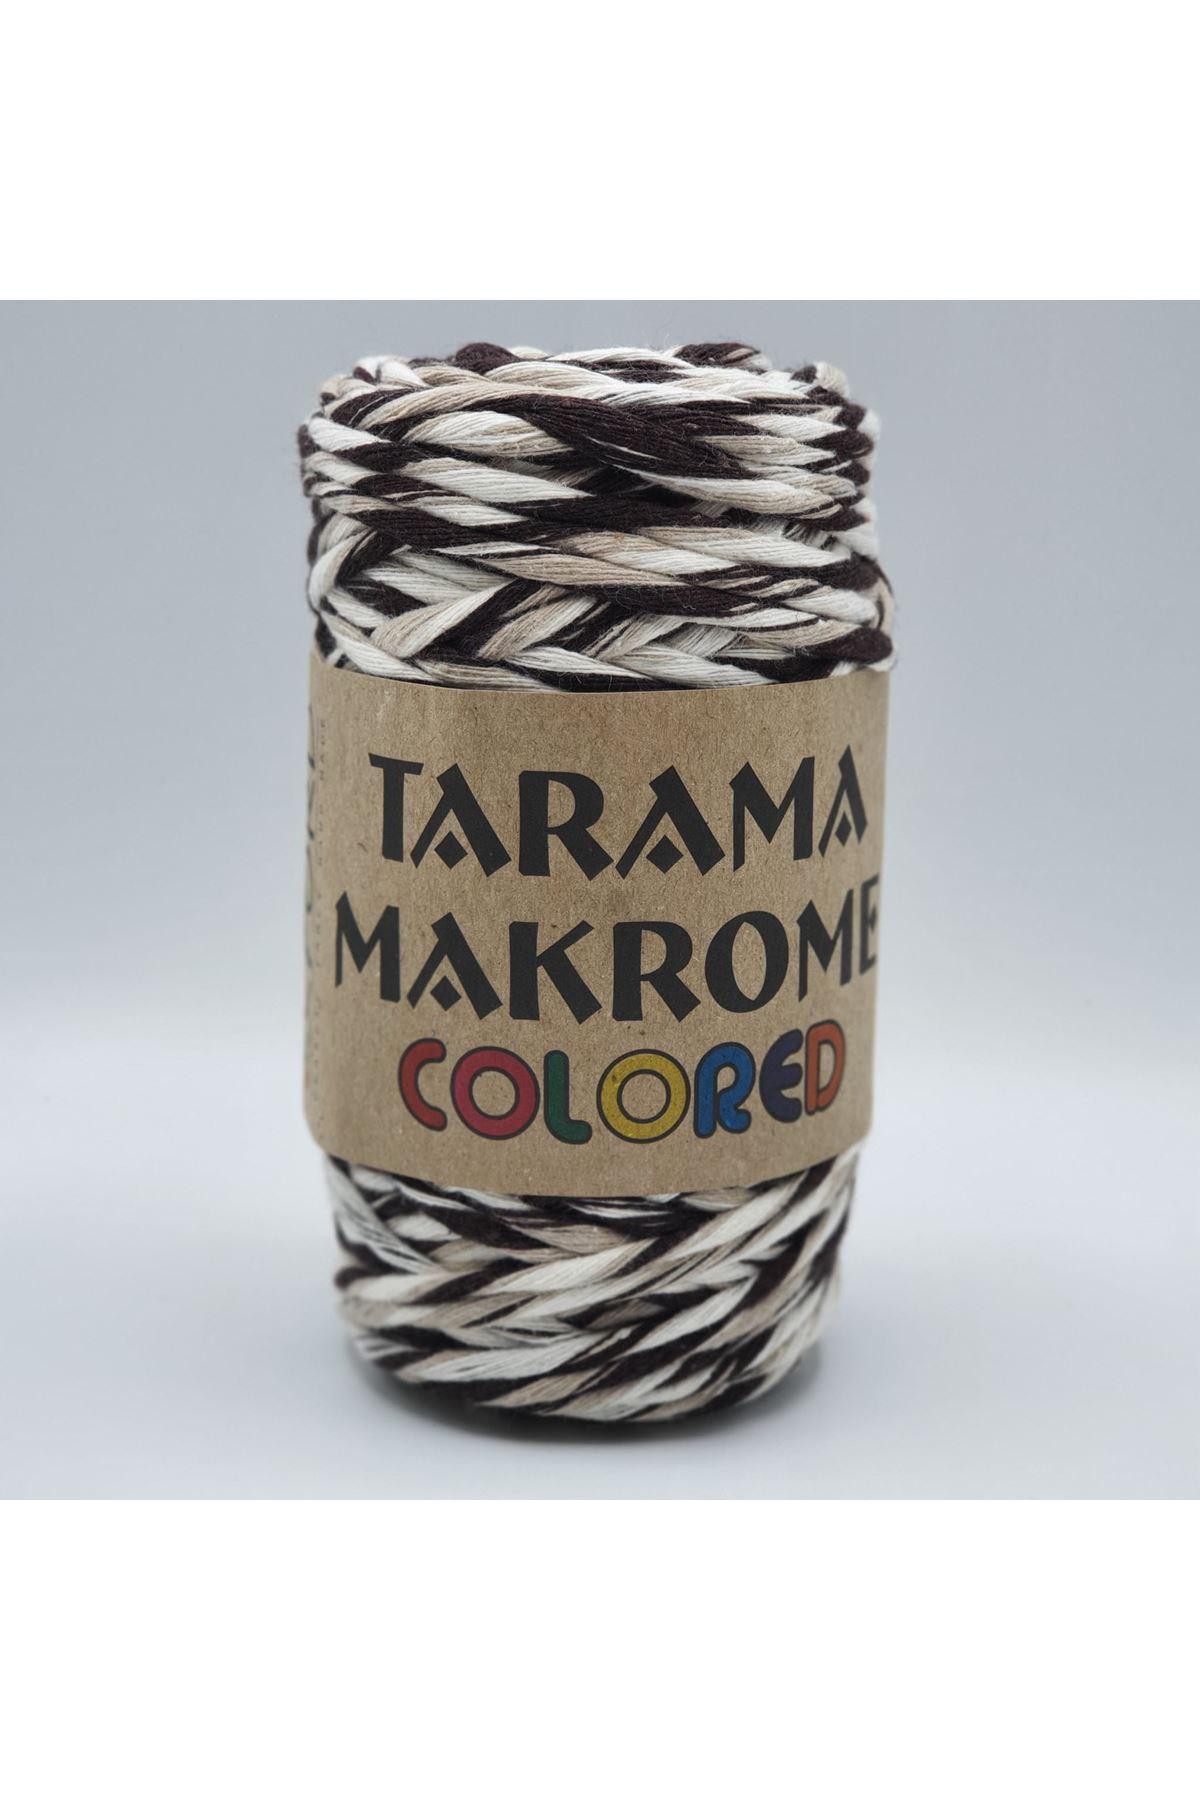 Tarama Makrome Colored 5 mm - 07